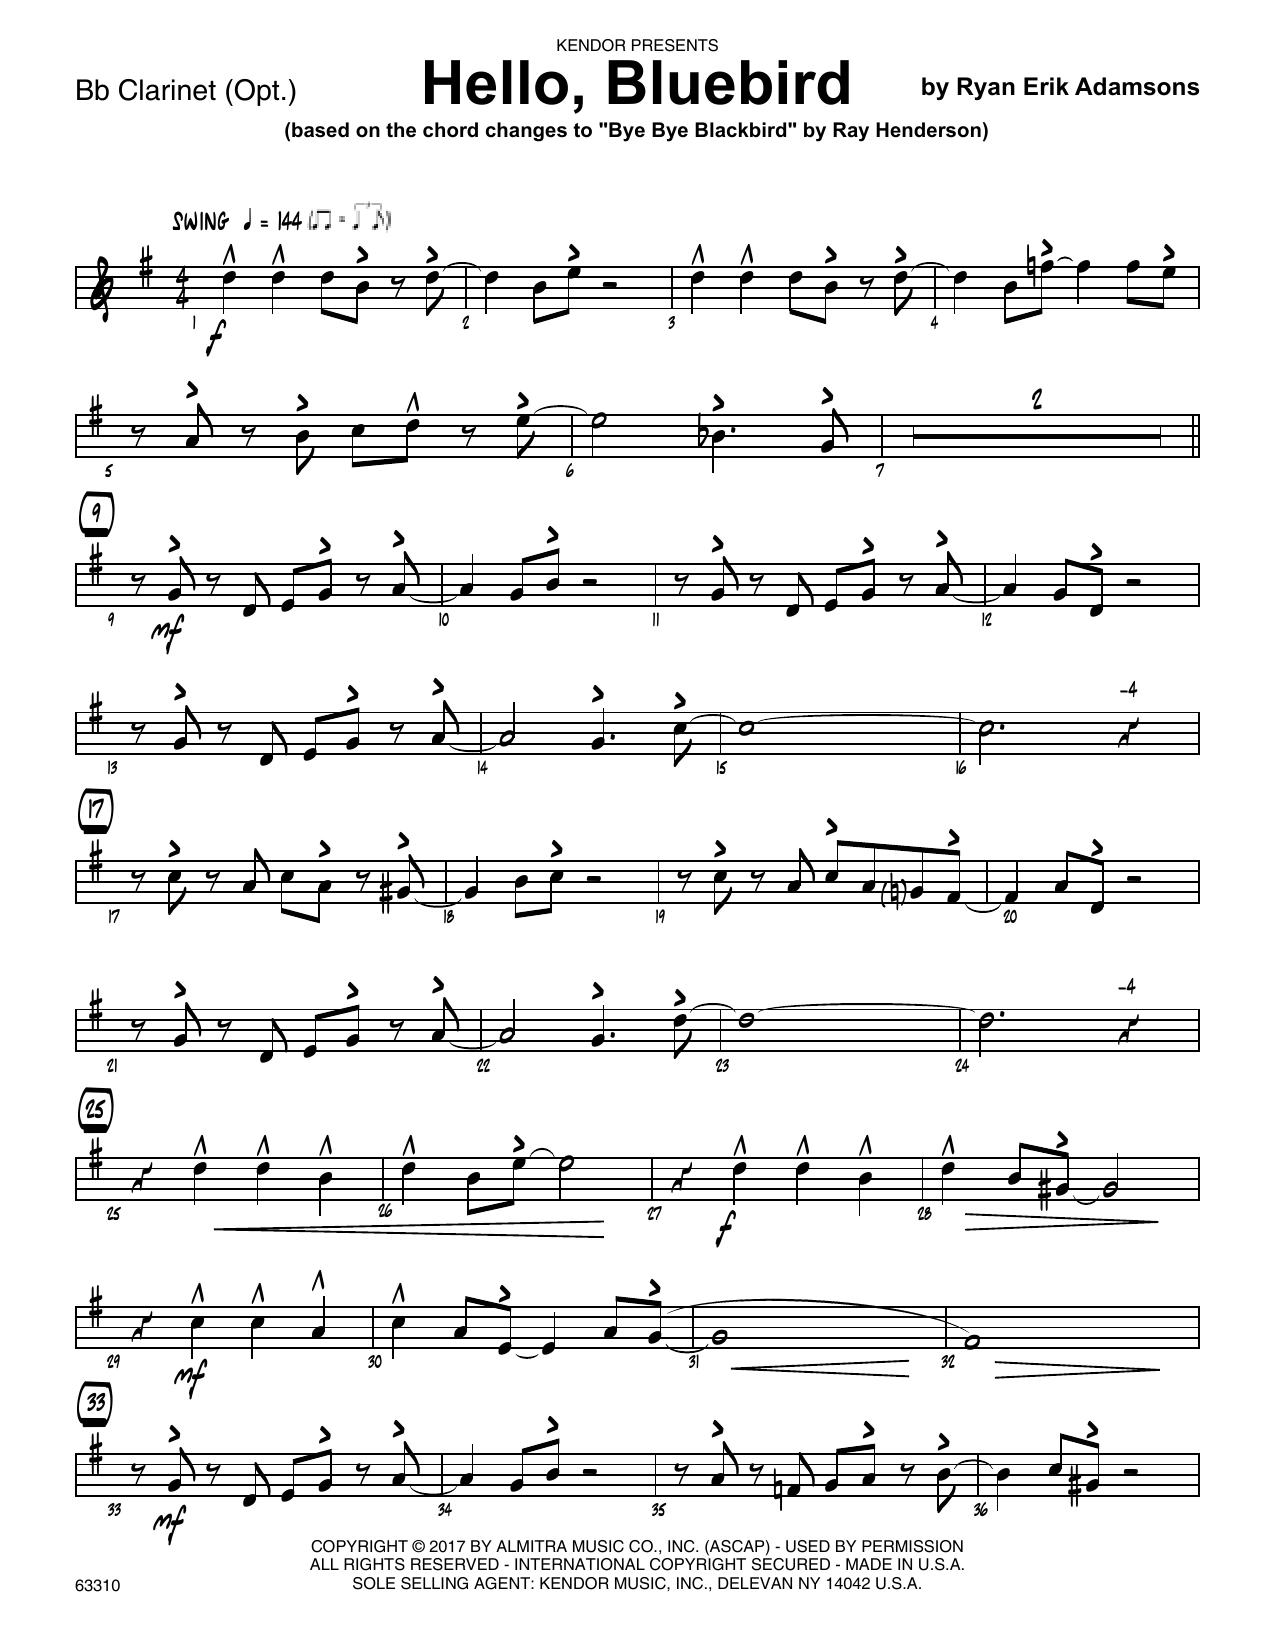 Ryan Erik Adamsons Hello, Bluebird (based on Bye Bye Blackbird) - Bb Clarinet sheet music notes printable PDF score